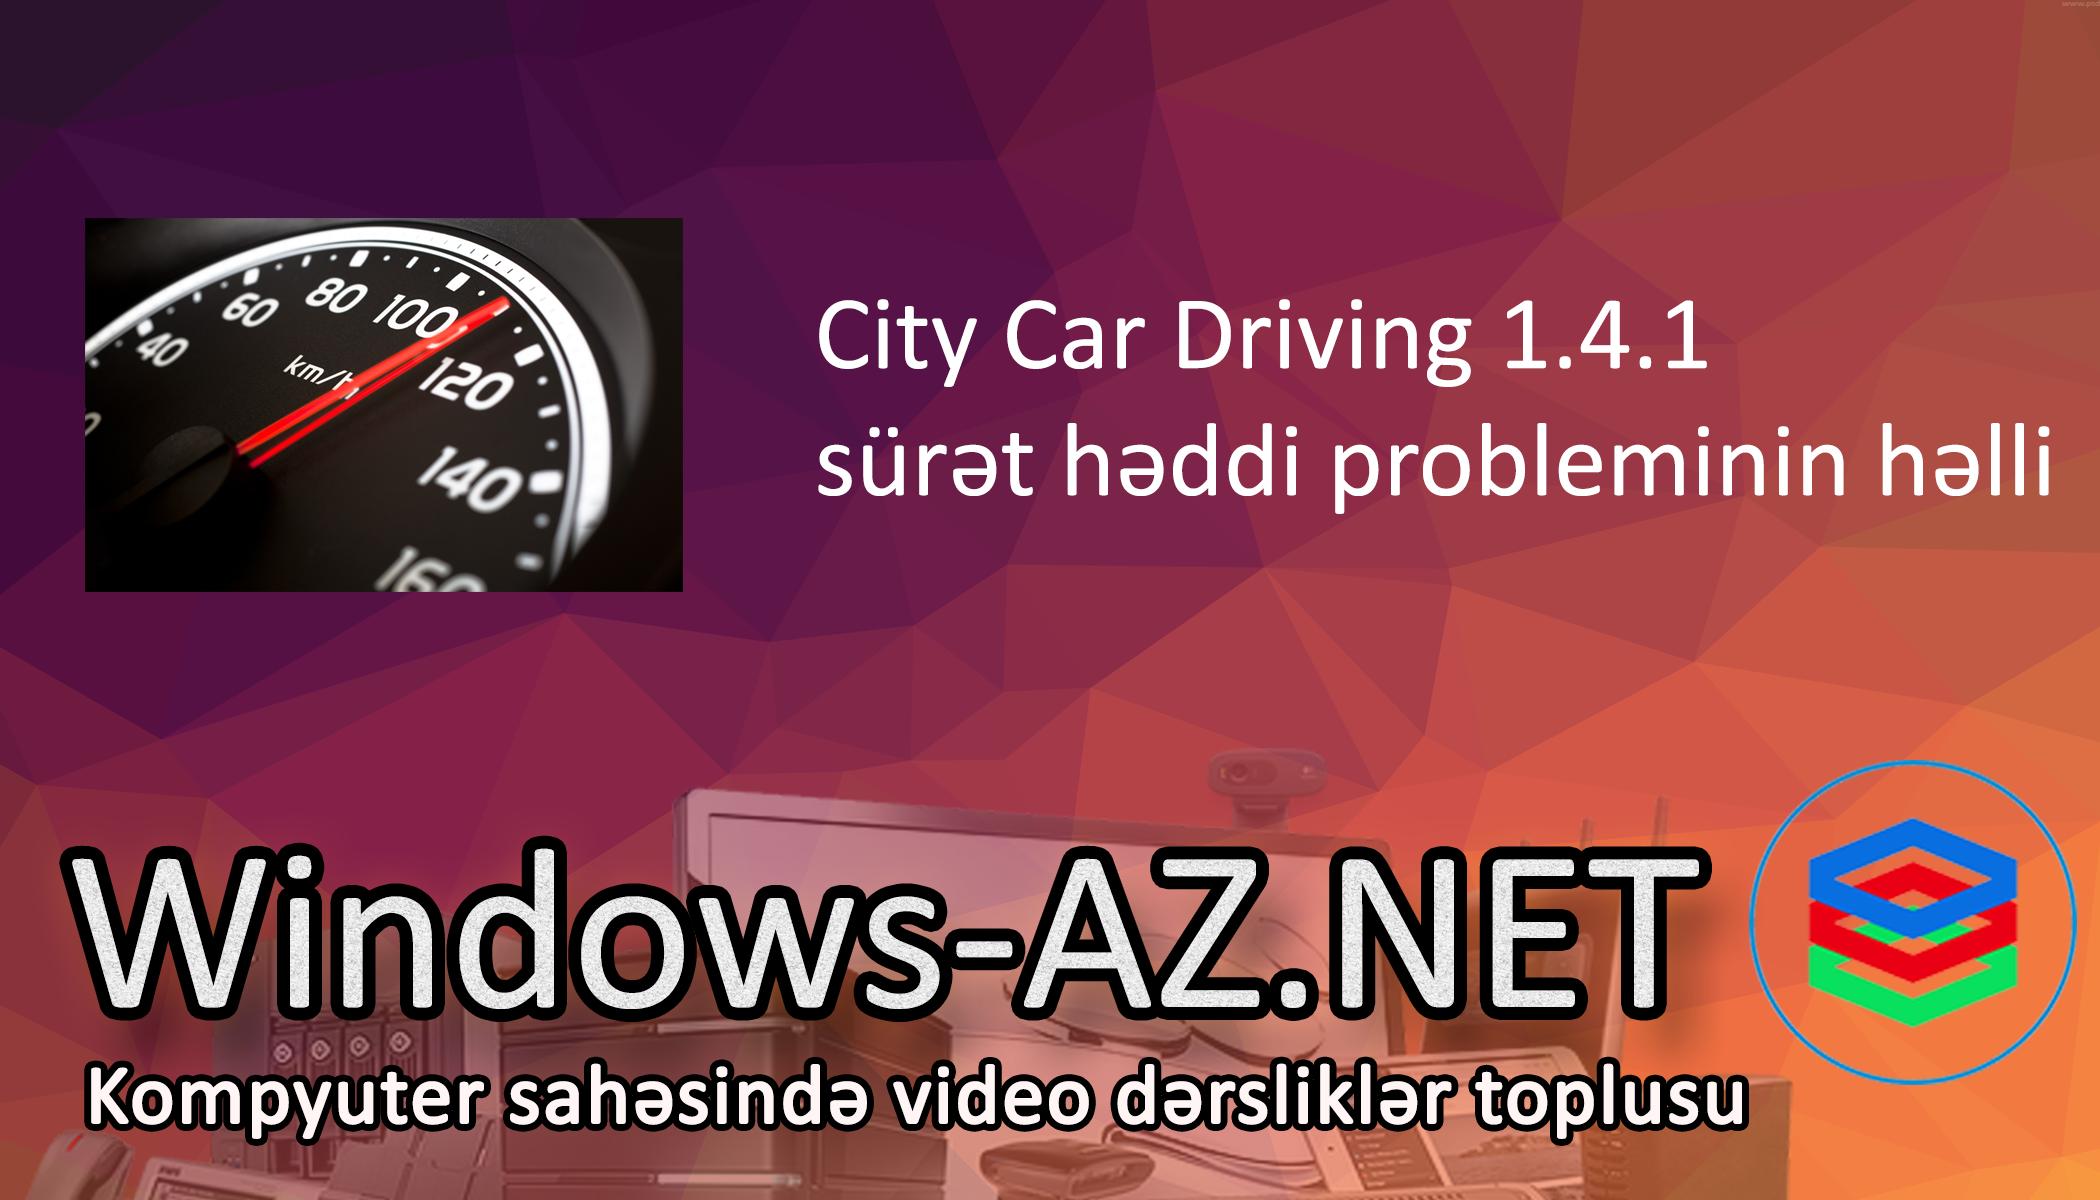 City Car Driving 1.4.1 sürət probleminin həlli